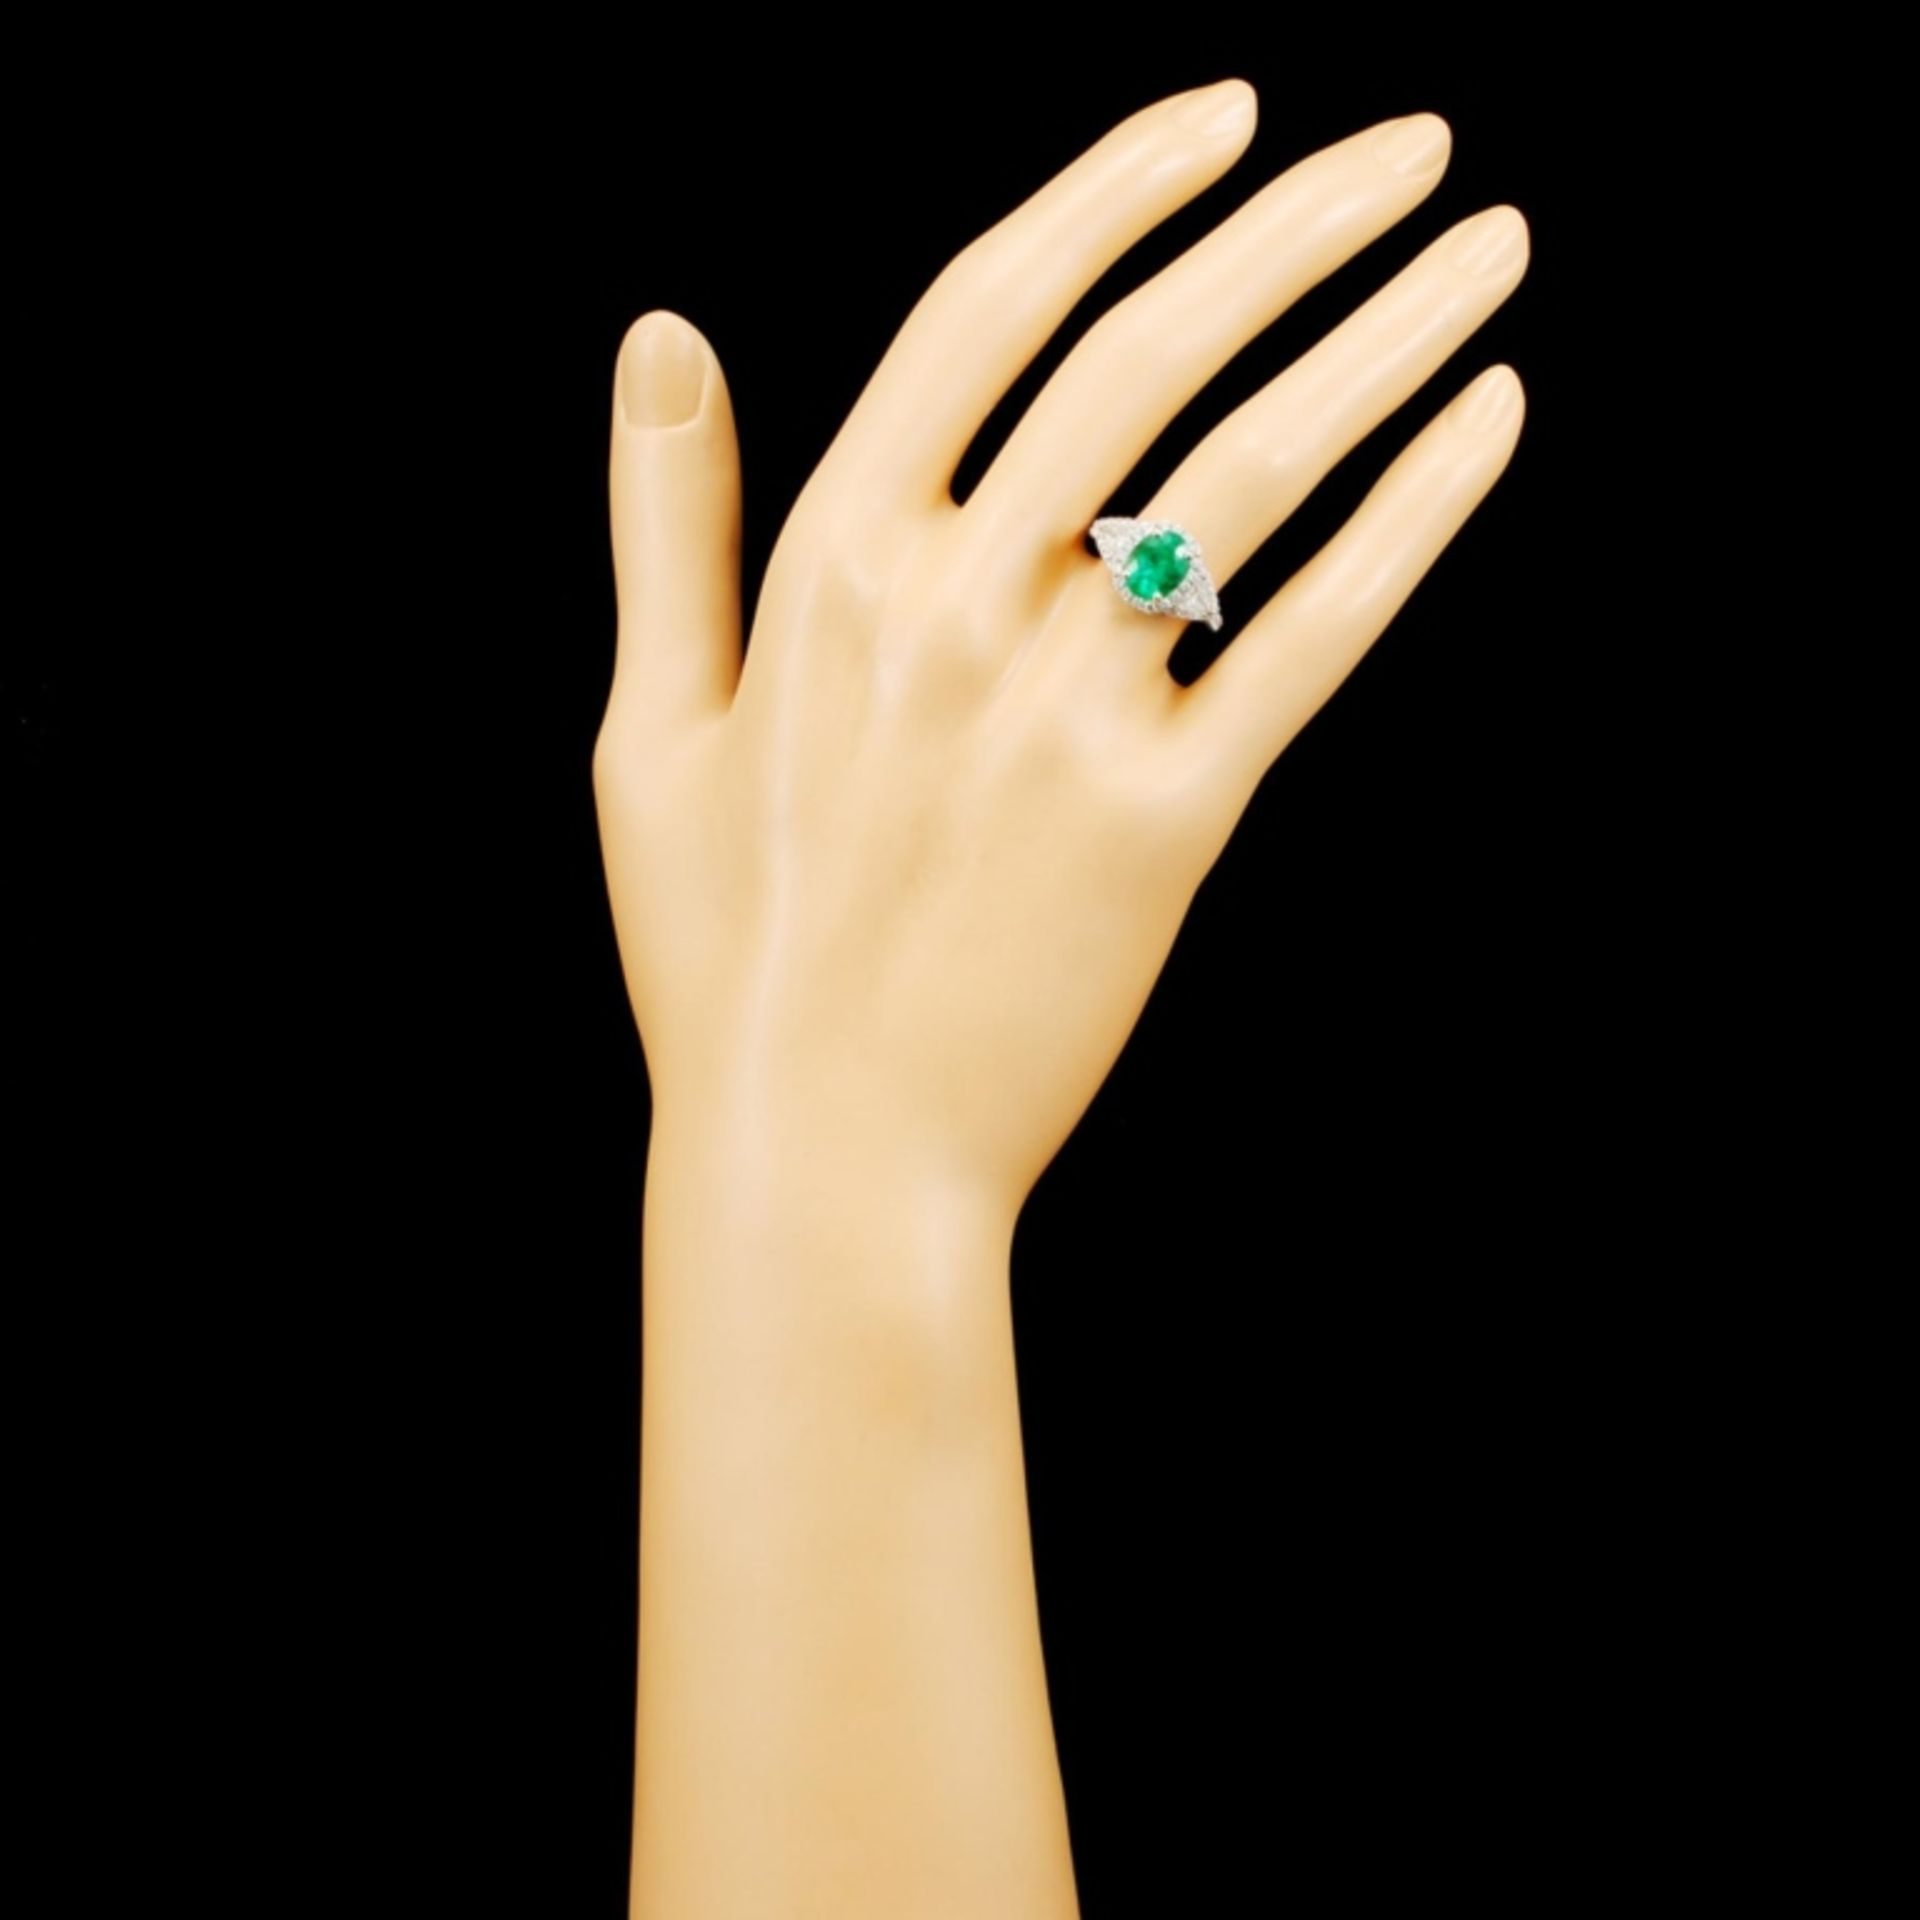 18K Gold 1.96ct Emerald & 0.95ctw Diamond Ring - Image 4 of 5